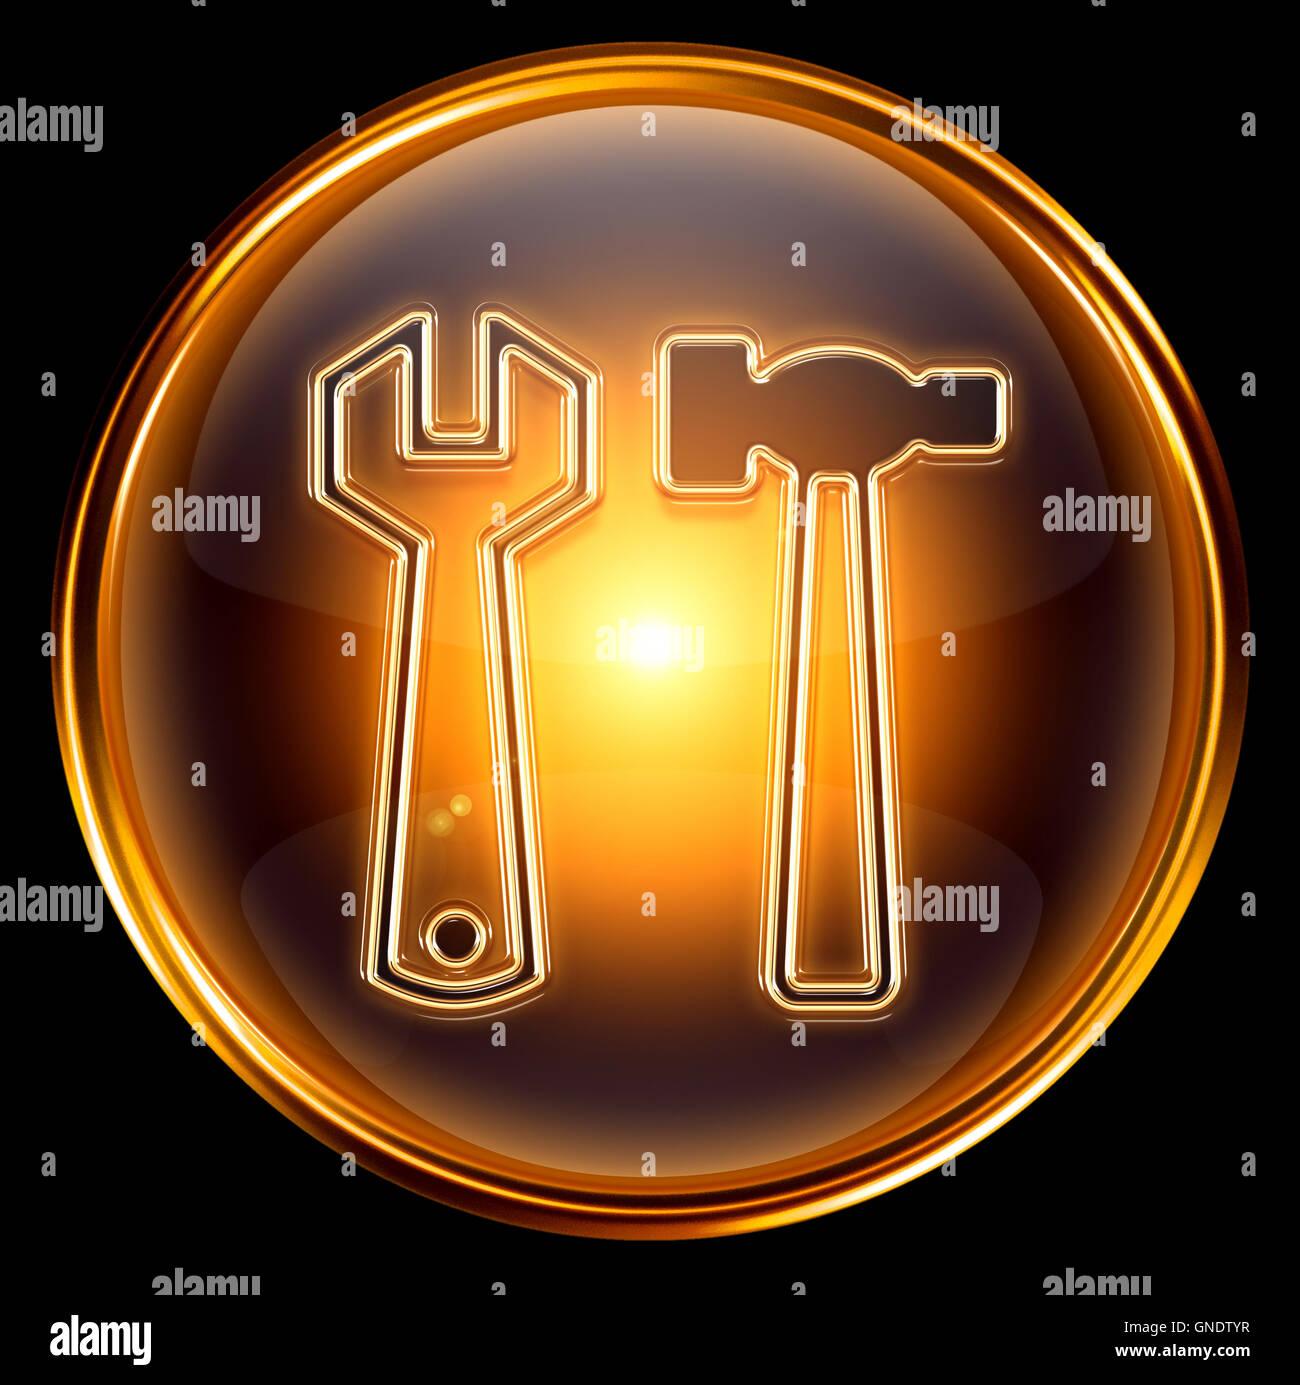 Tools icon gold, isolated on black background - Stock Image